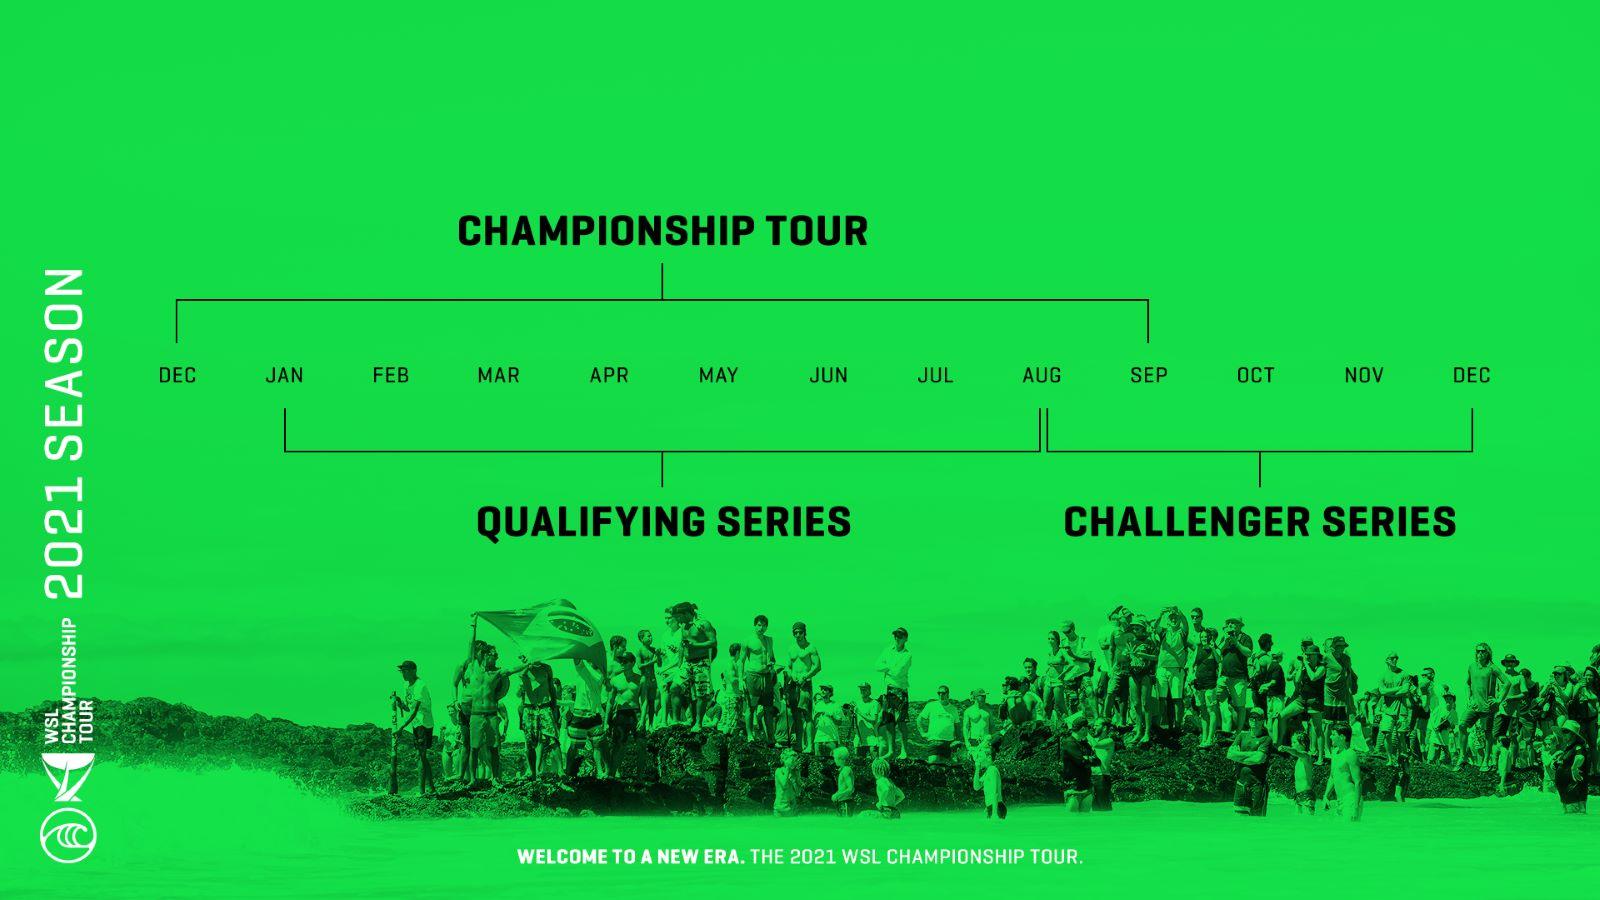 2021 WSL Year calendar